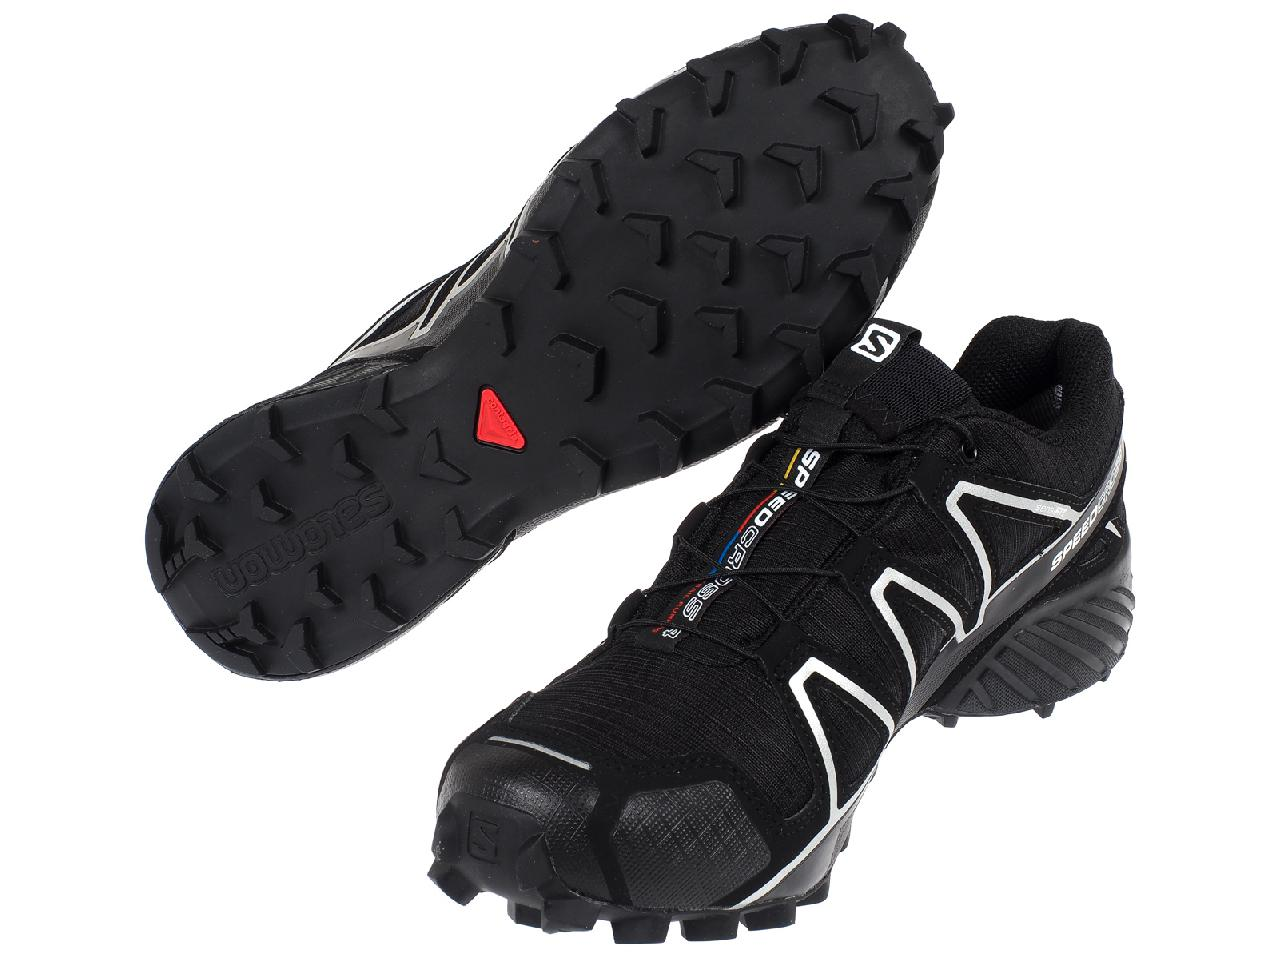 Zapatos-Running-Rastro-Salomon-Speed-Cross-4-GTX-Nr-Run-Negro-24186-Nuevo miniatura 5